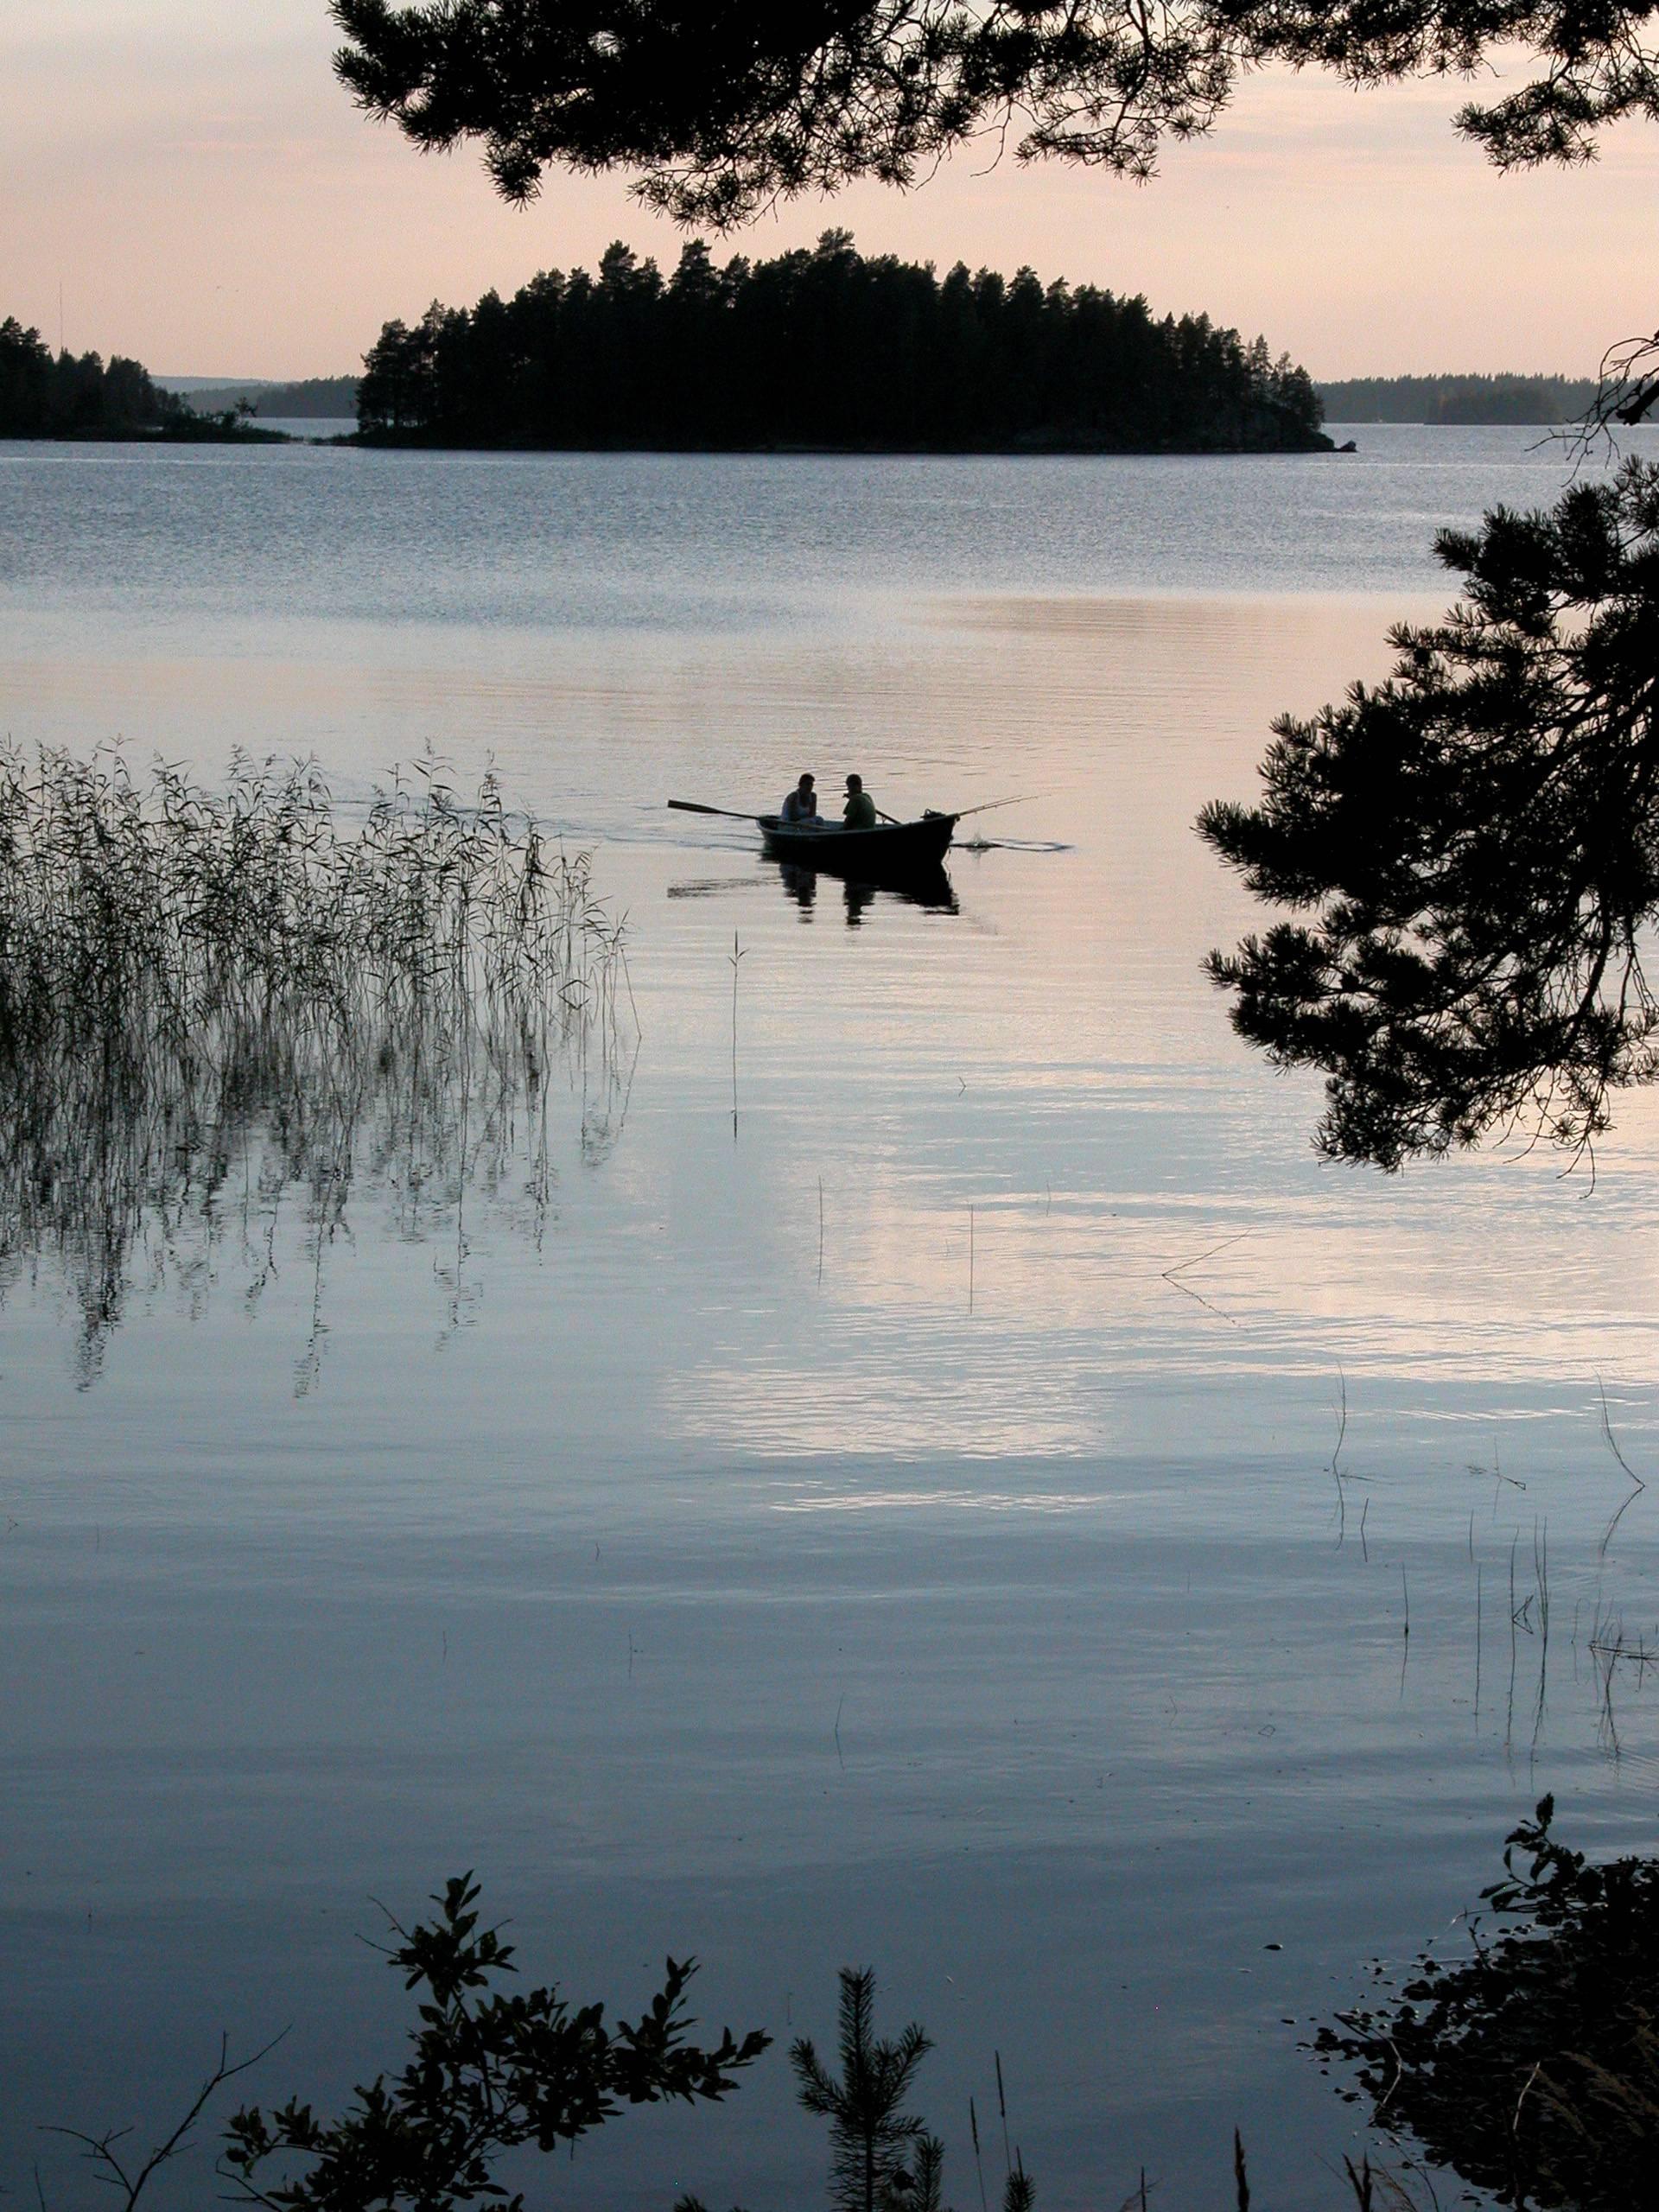 ᐉ умбозеро - место для рыбака - ✅ ribalka-snasti.ru